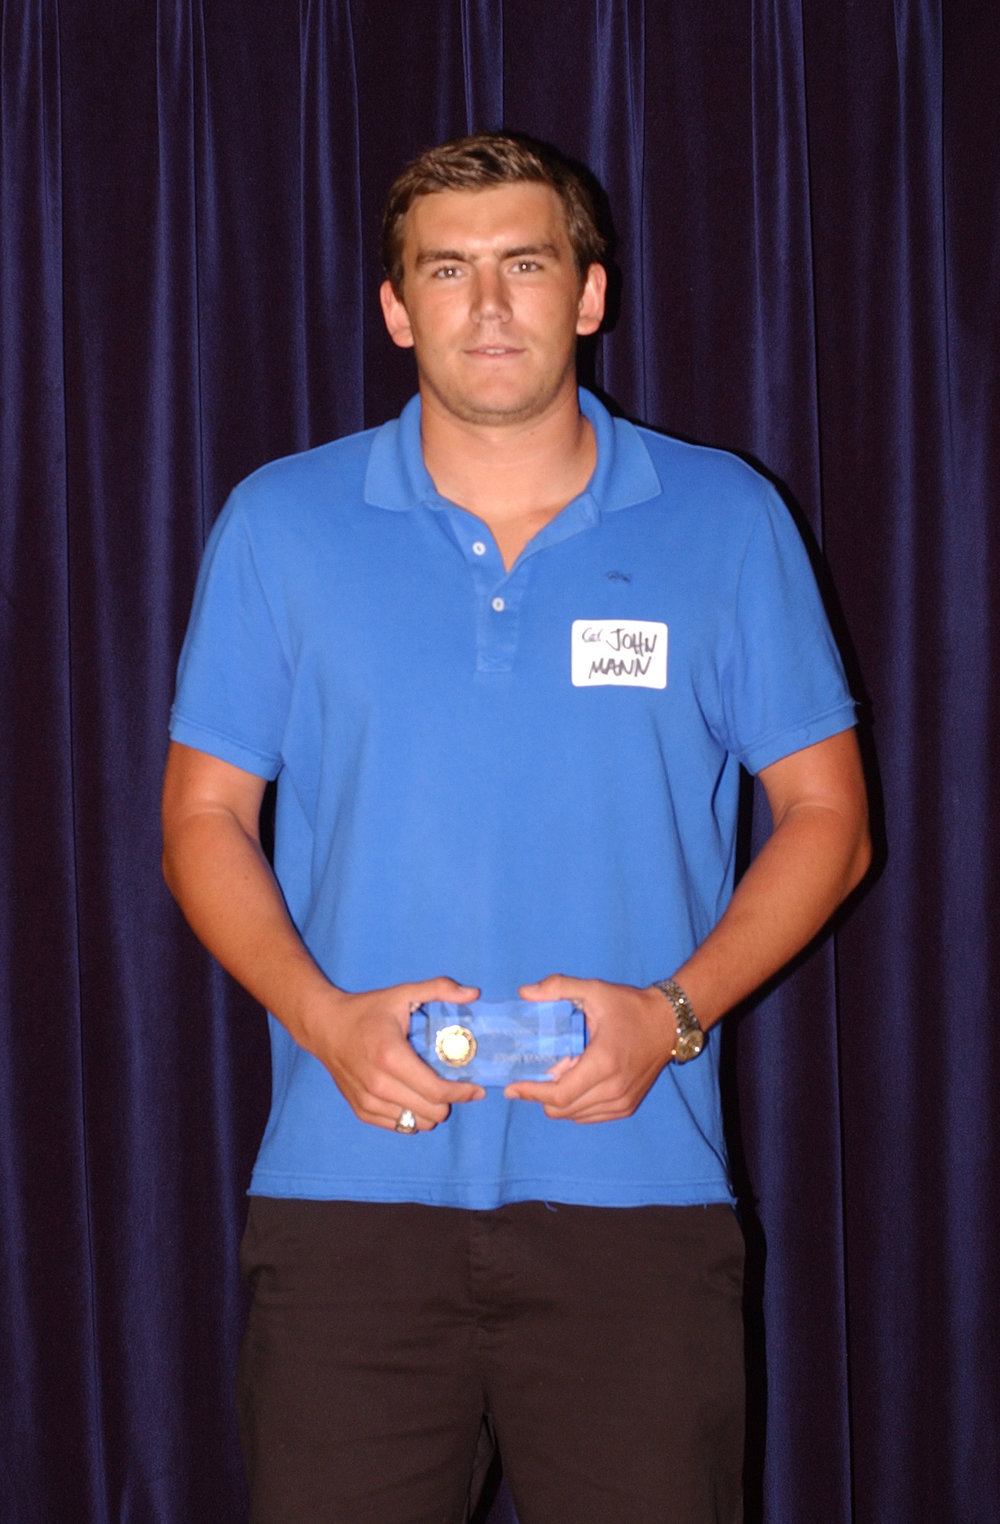 07Honors Mann w award 44.jpg